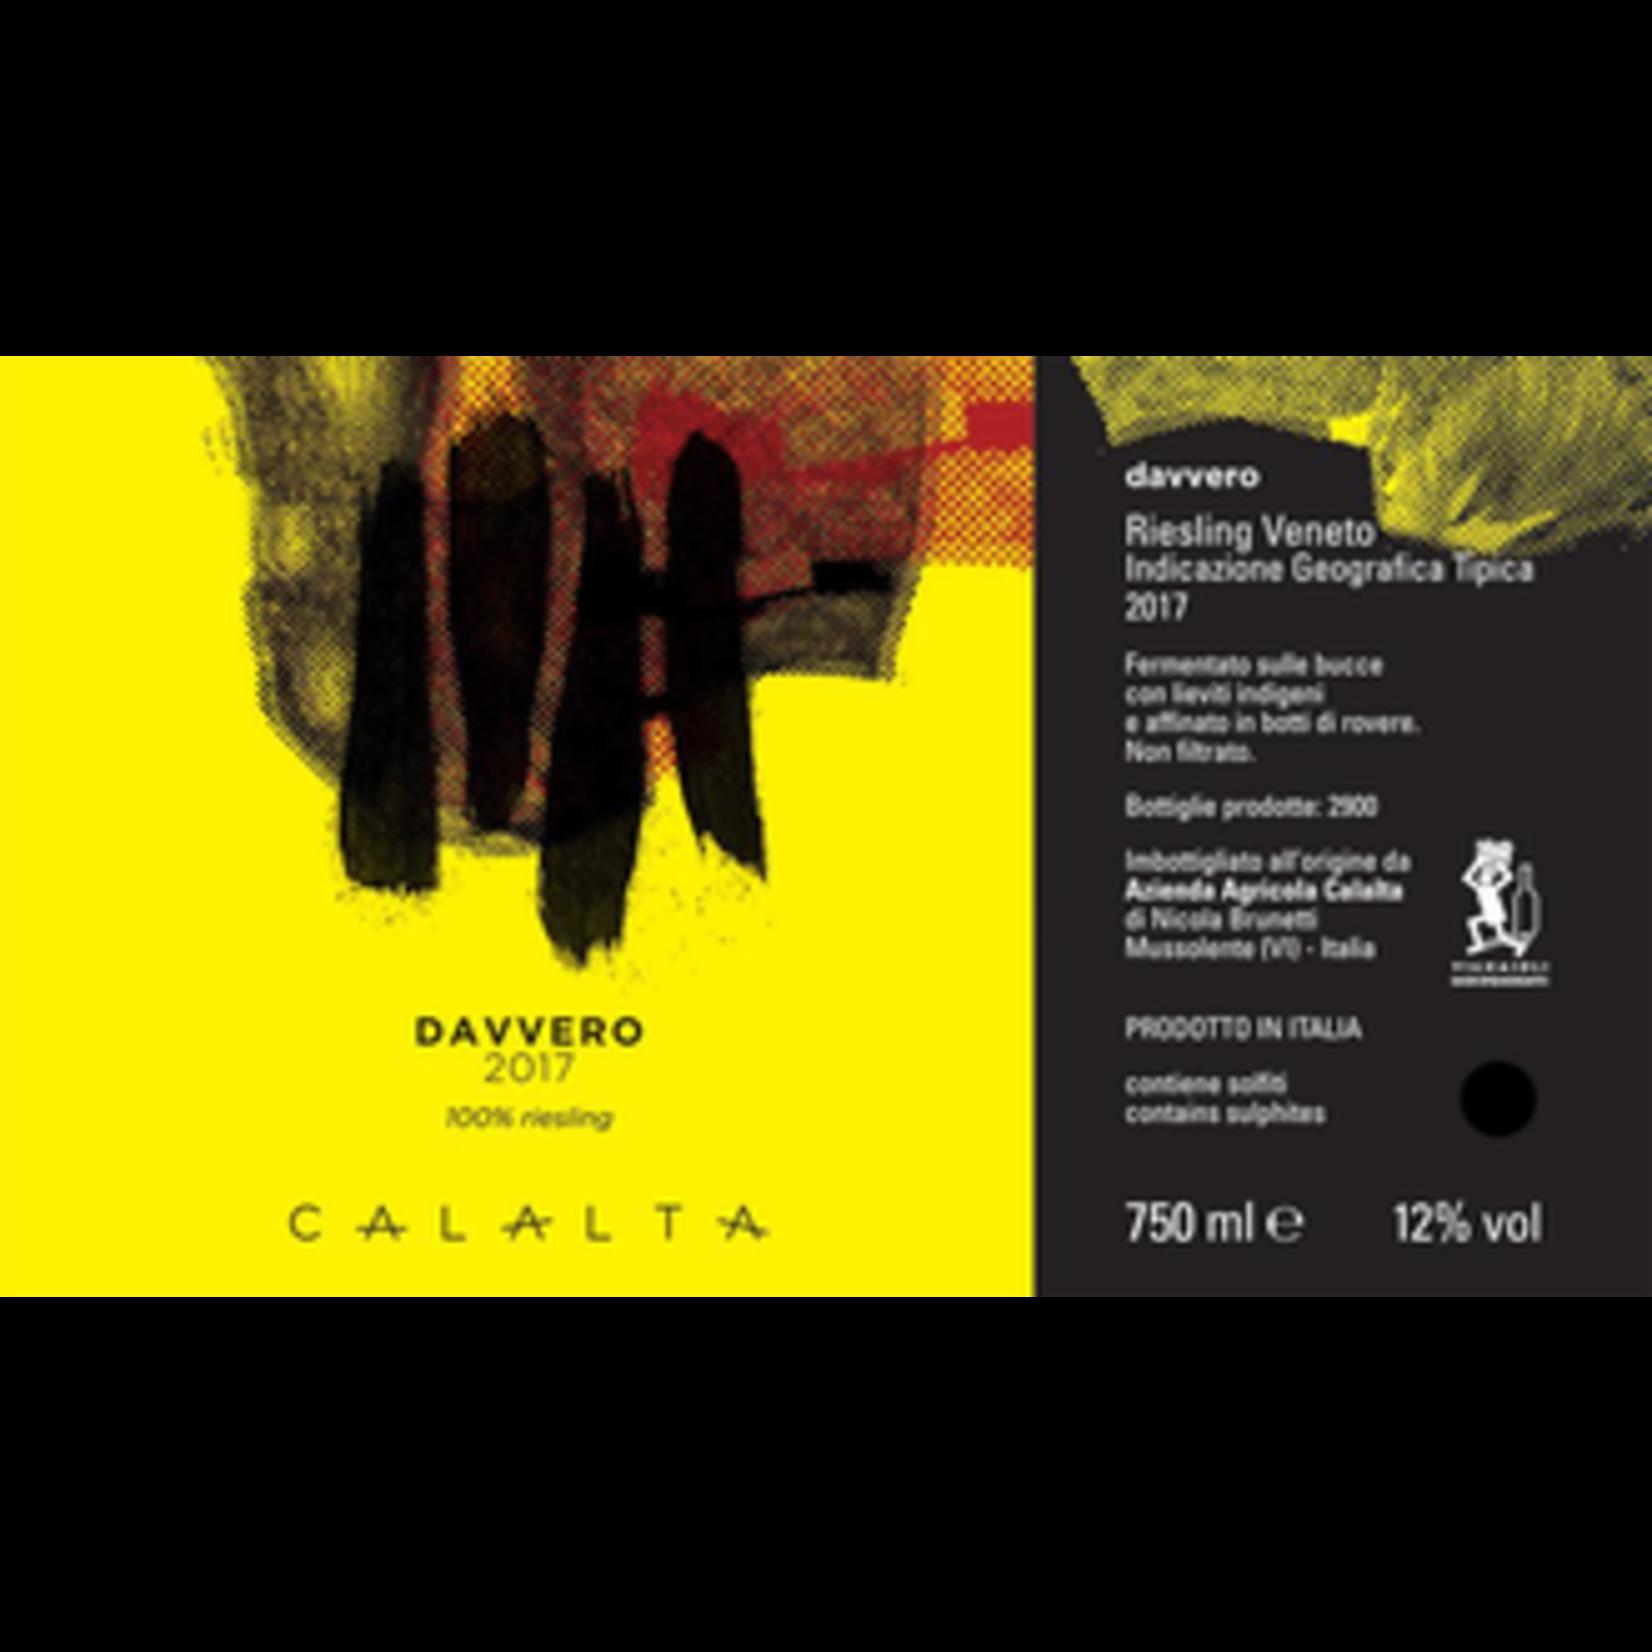 Wine Calalta Davvero Riesling 2019